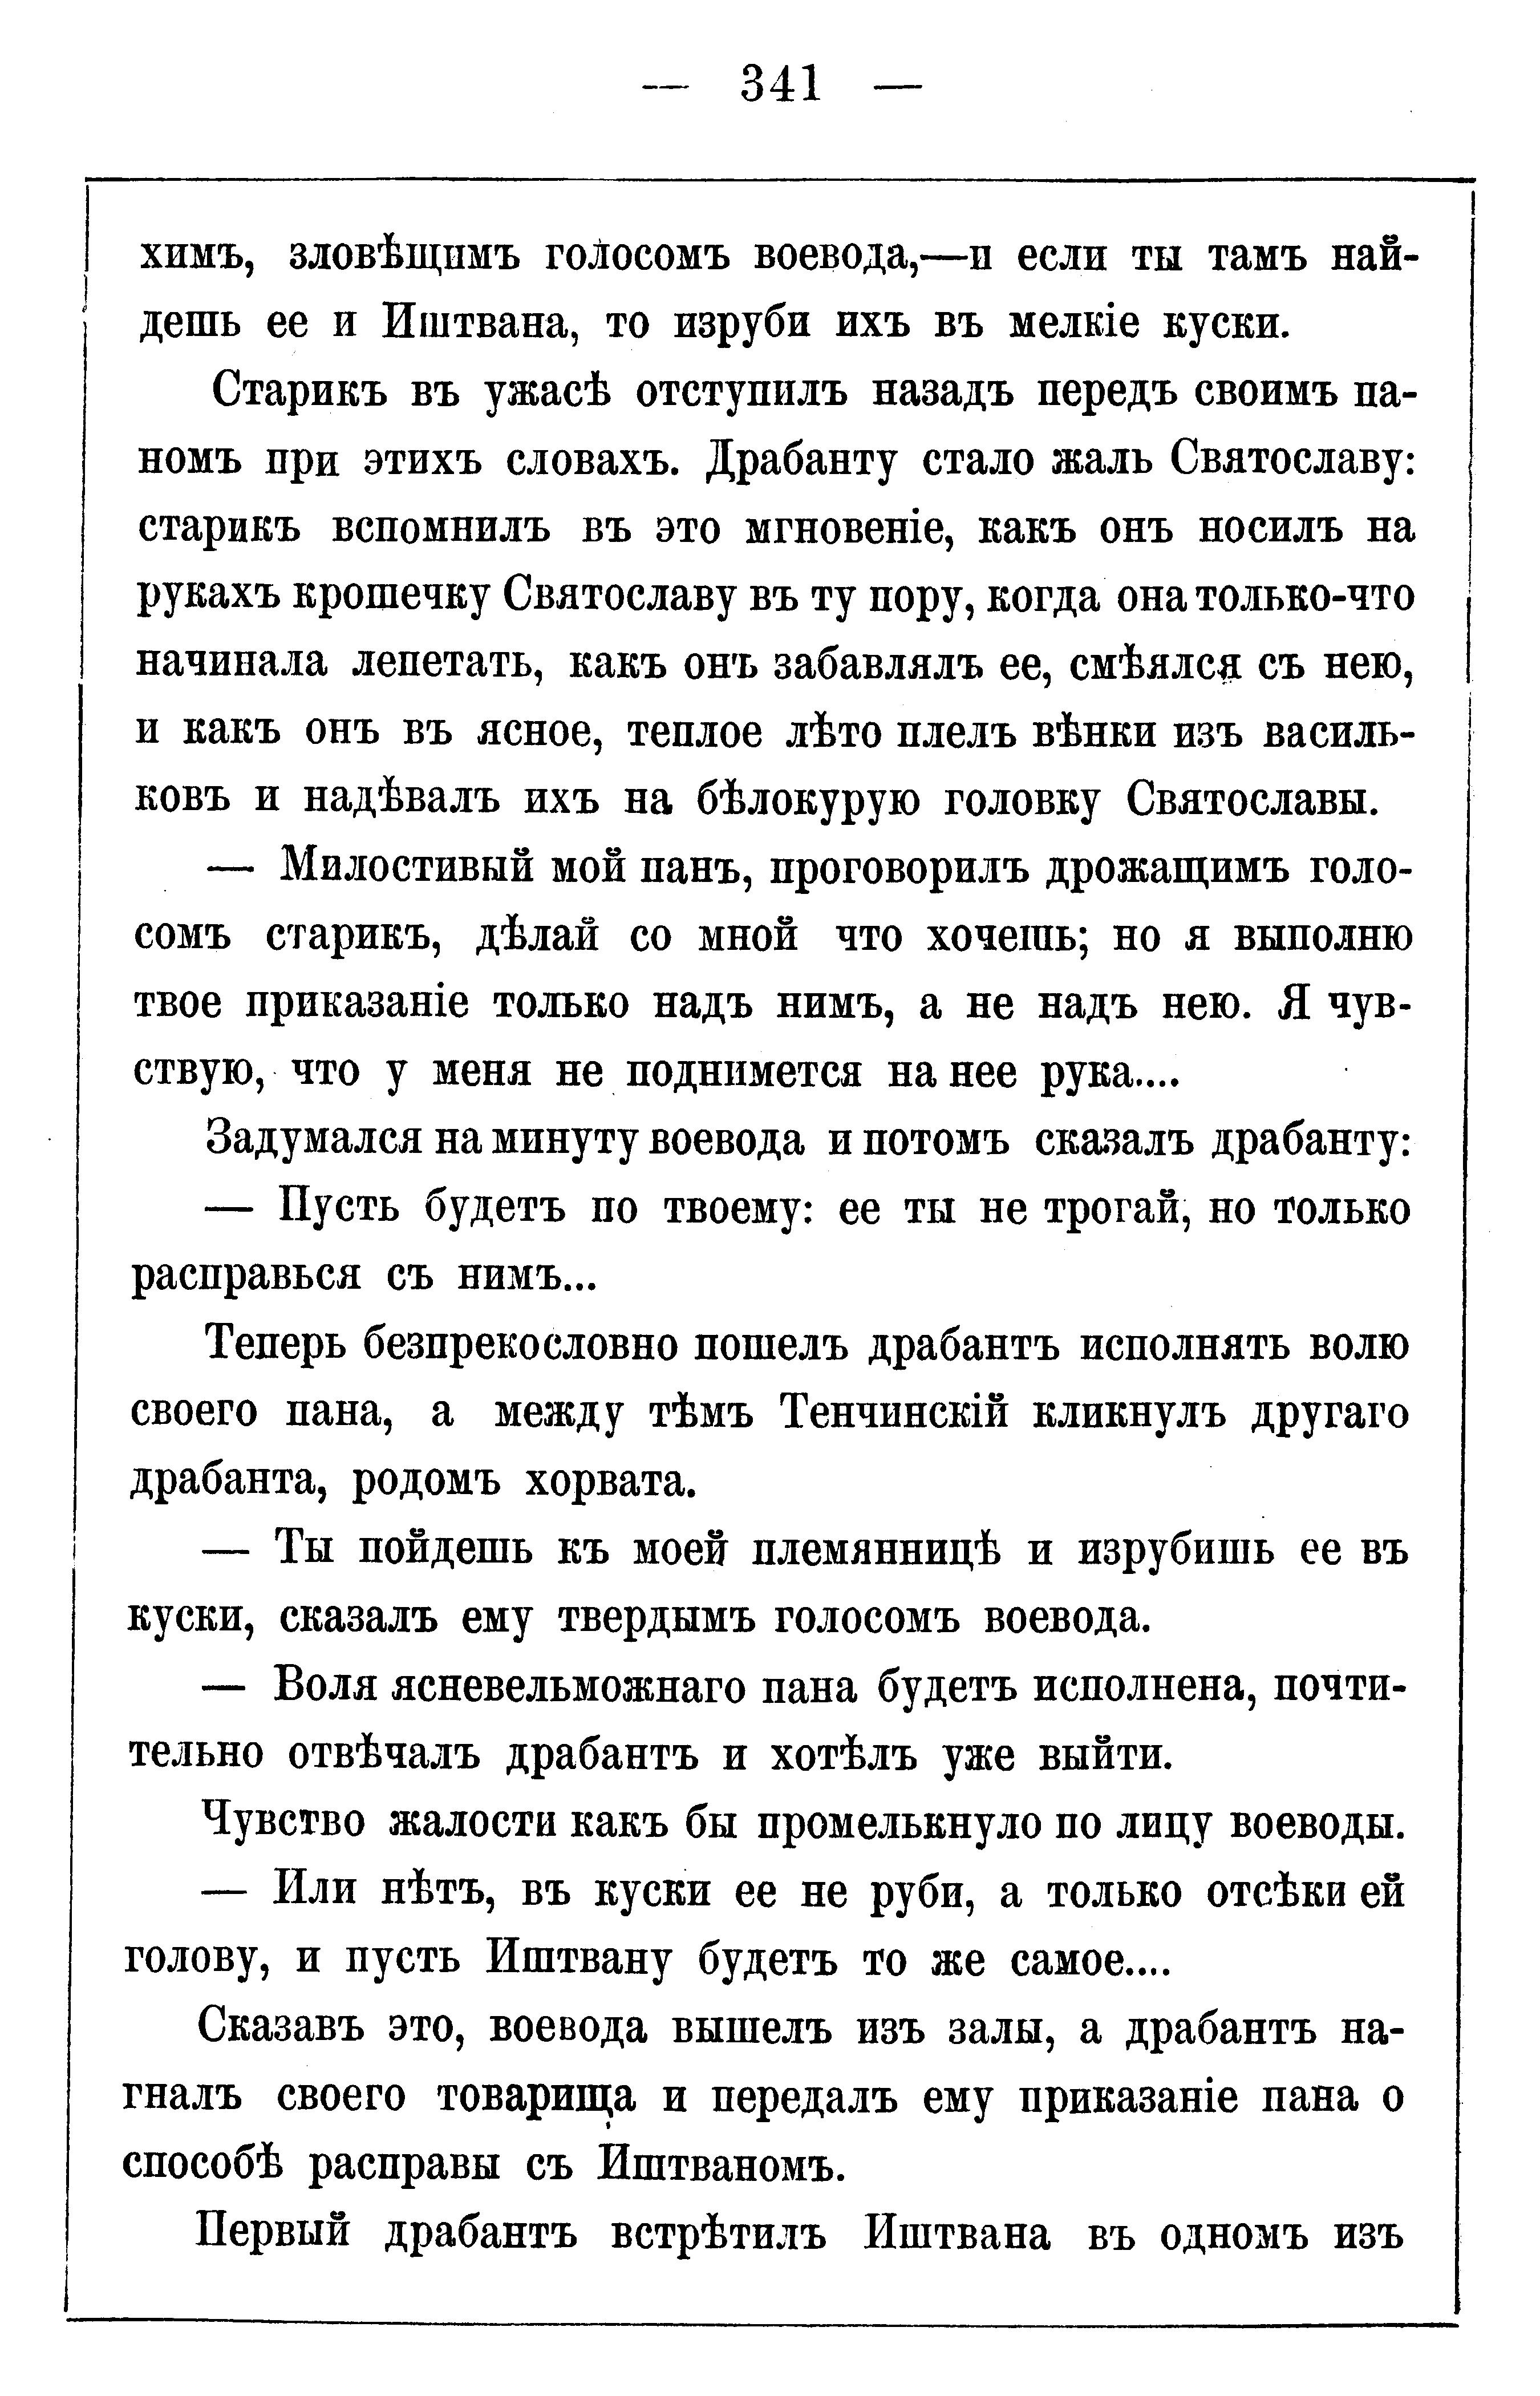 Биткоин в россии запрещен 2017 год-5